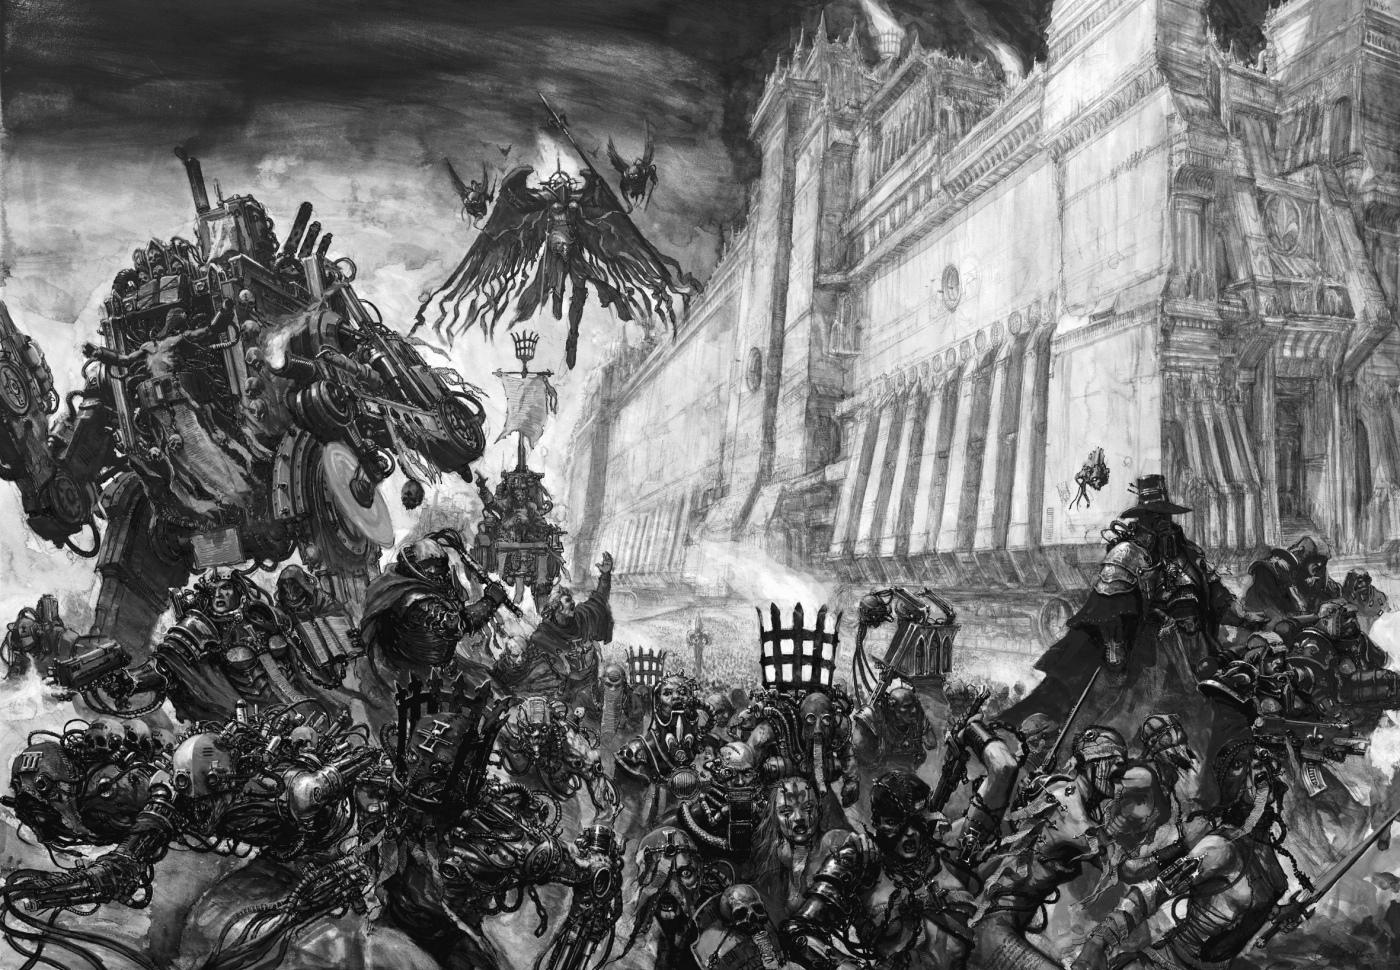 warhammer-40000-art-d0bfd0b5d181d0bed187d0bdd0b8d186d0b0-imperium-322656